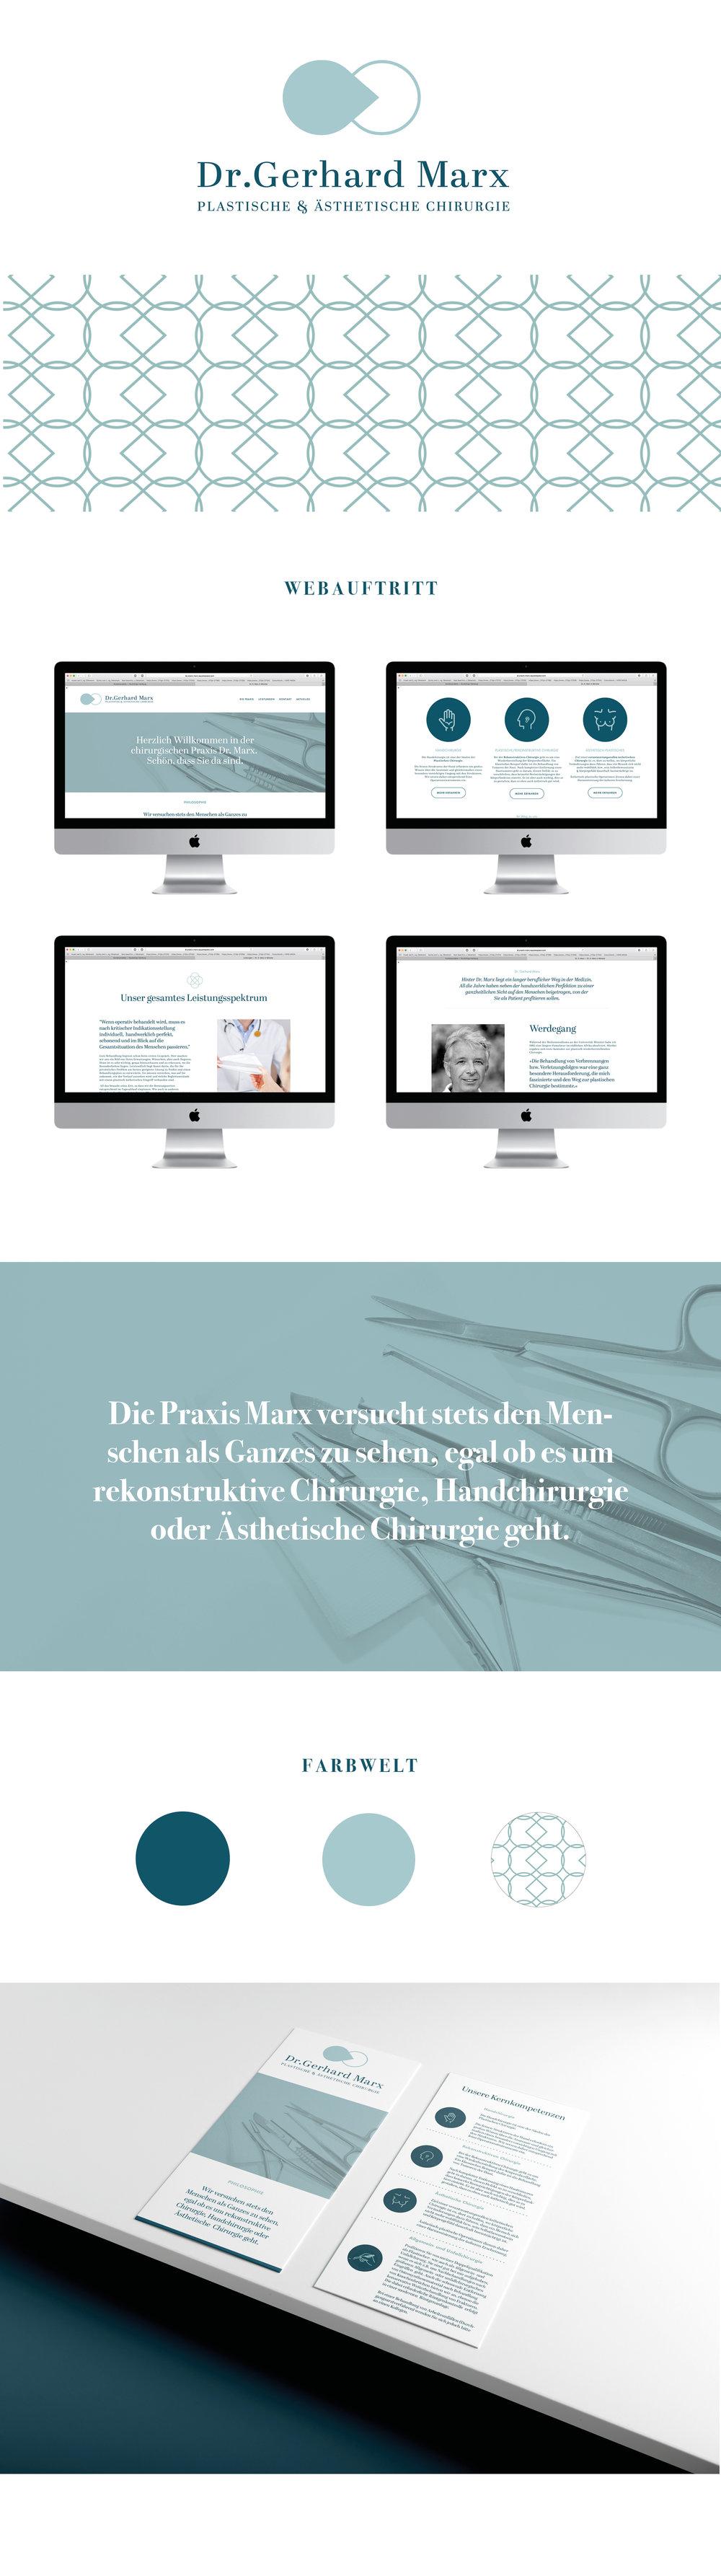 drmarx_webpräsentation_studiofrigo.jpg